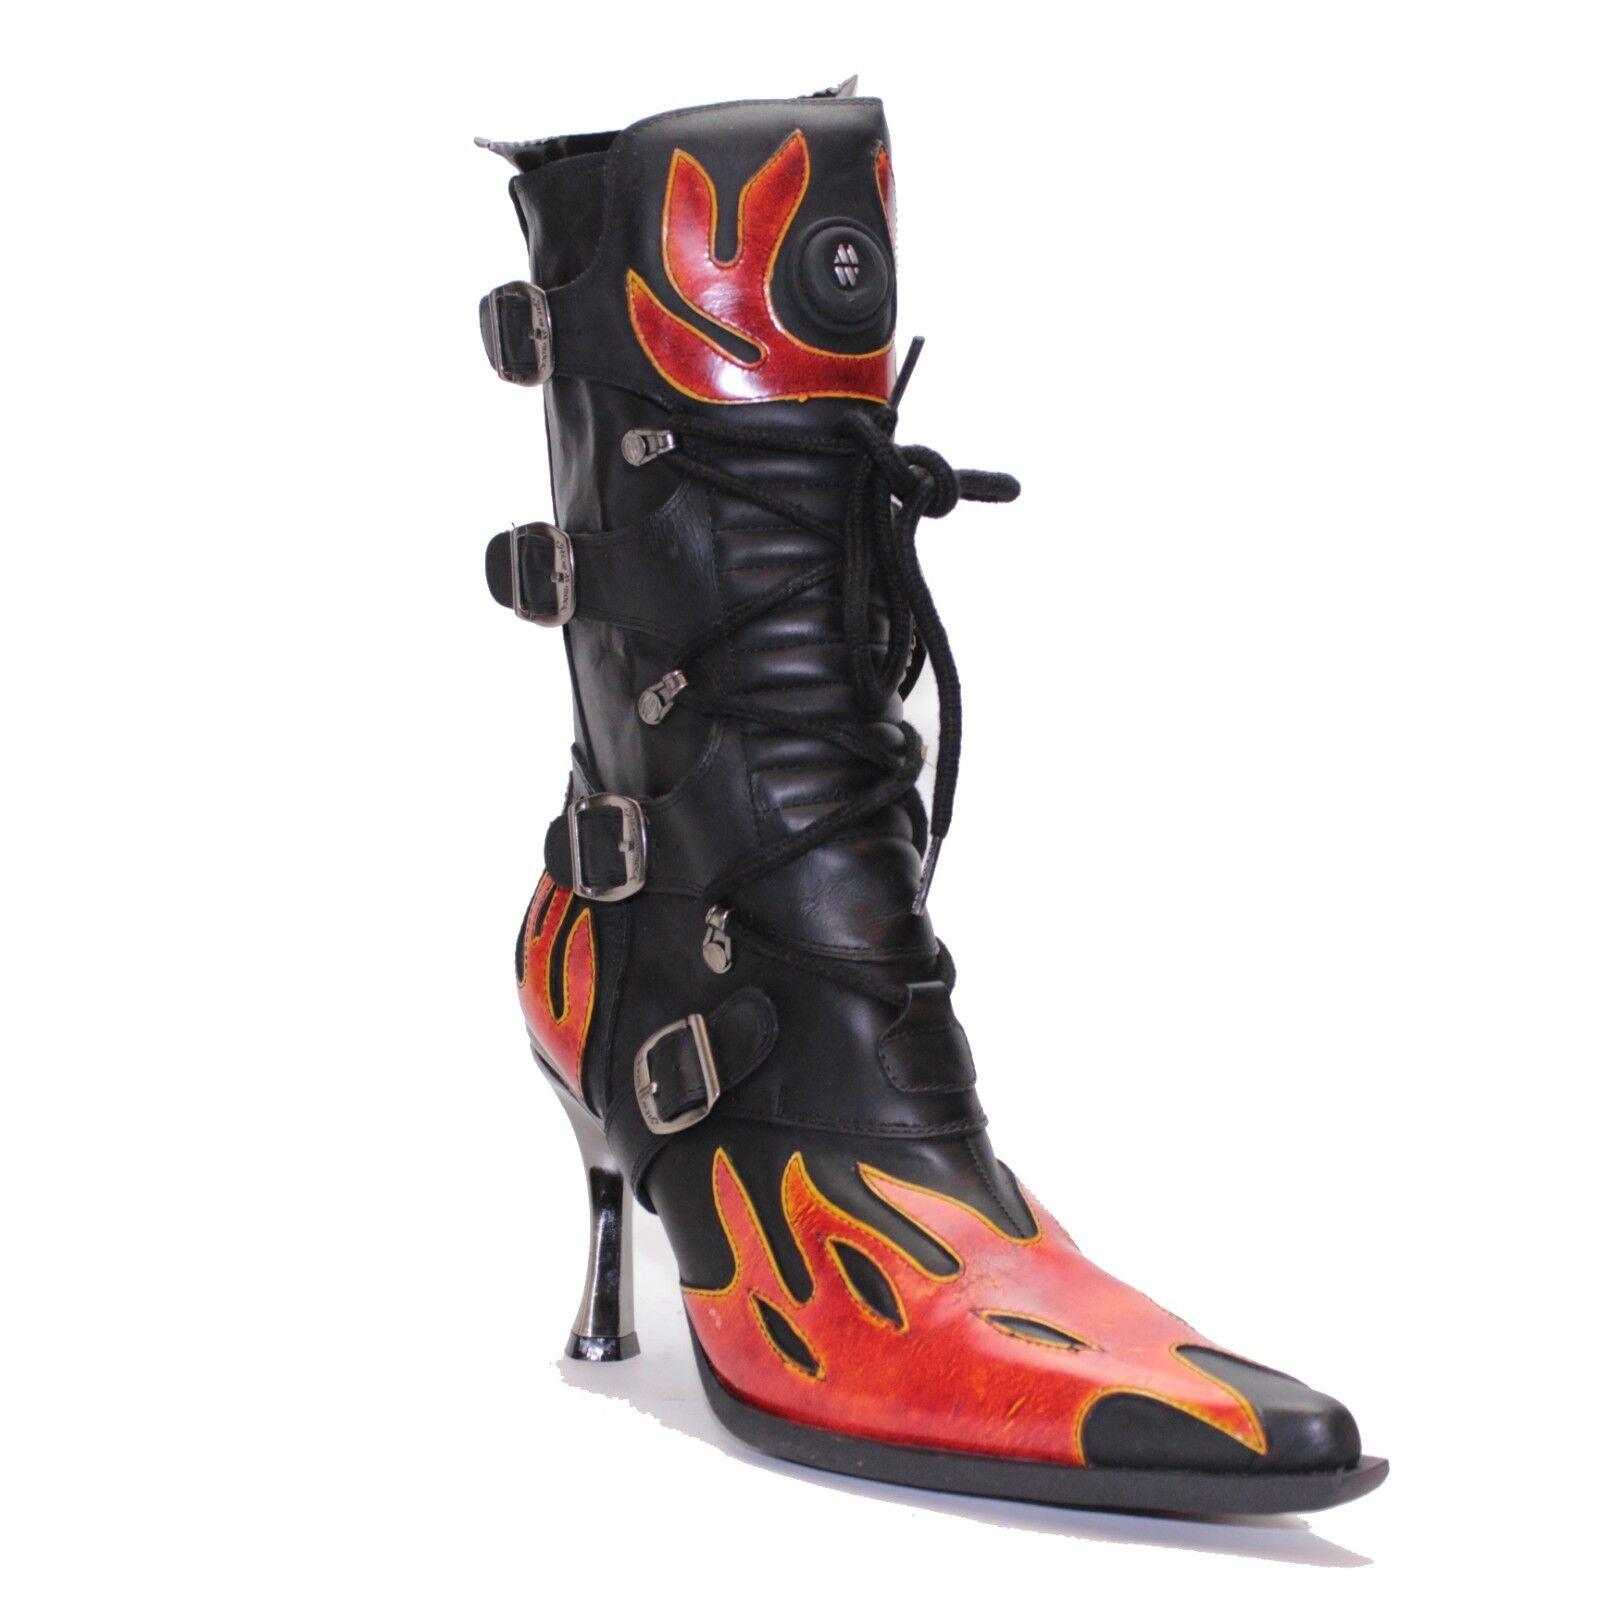 New Rock M.9591-S1 Flame Punk Rock Alternative Goth High Heel Stiefel UK 6.5 EU 40